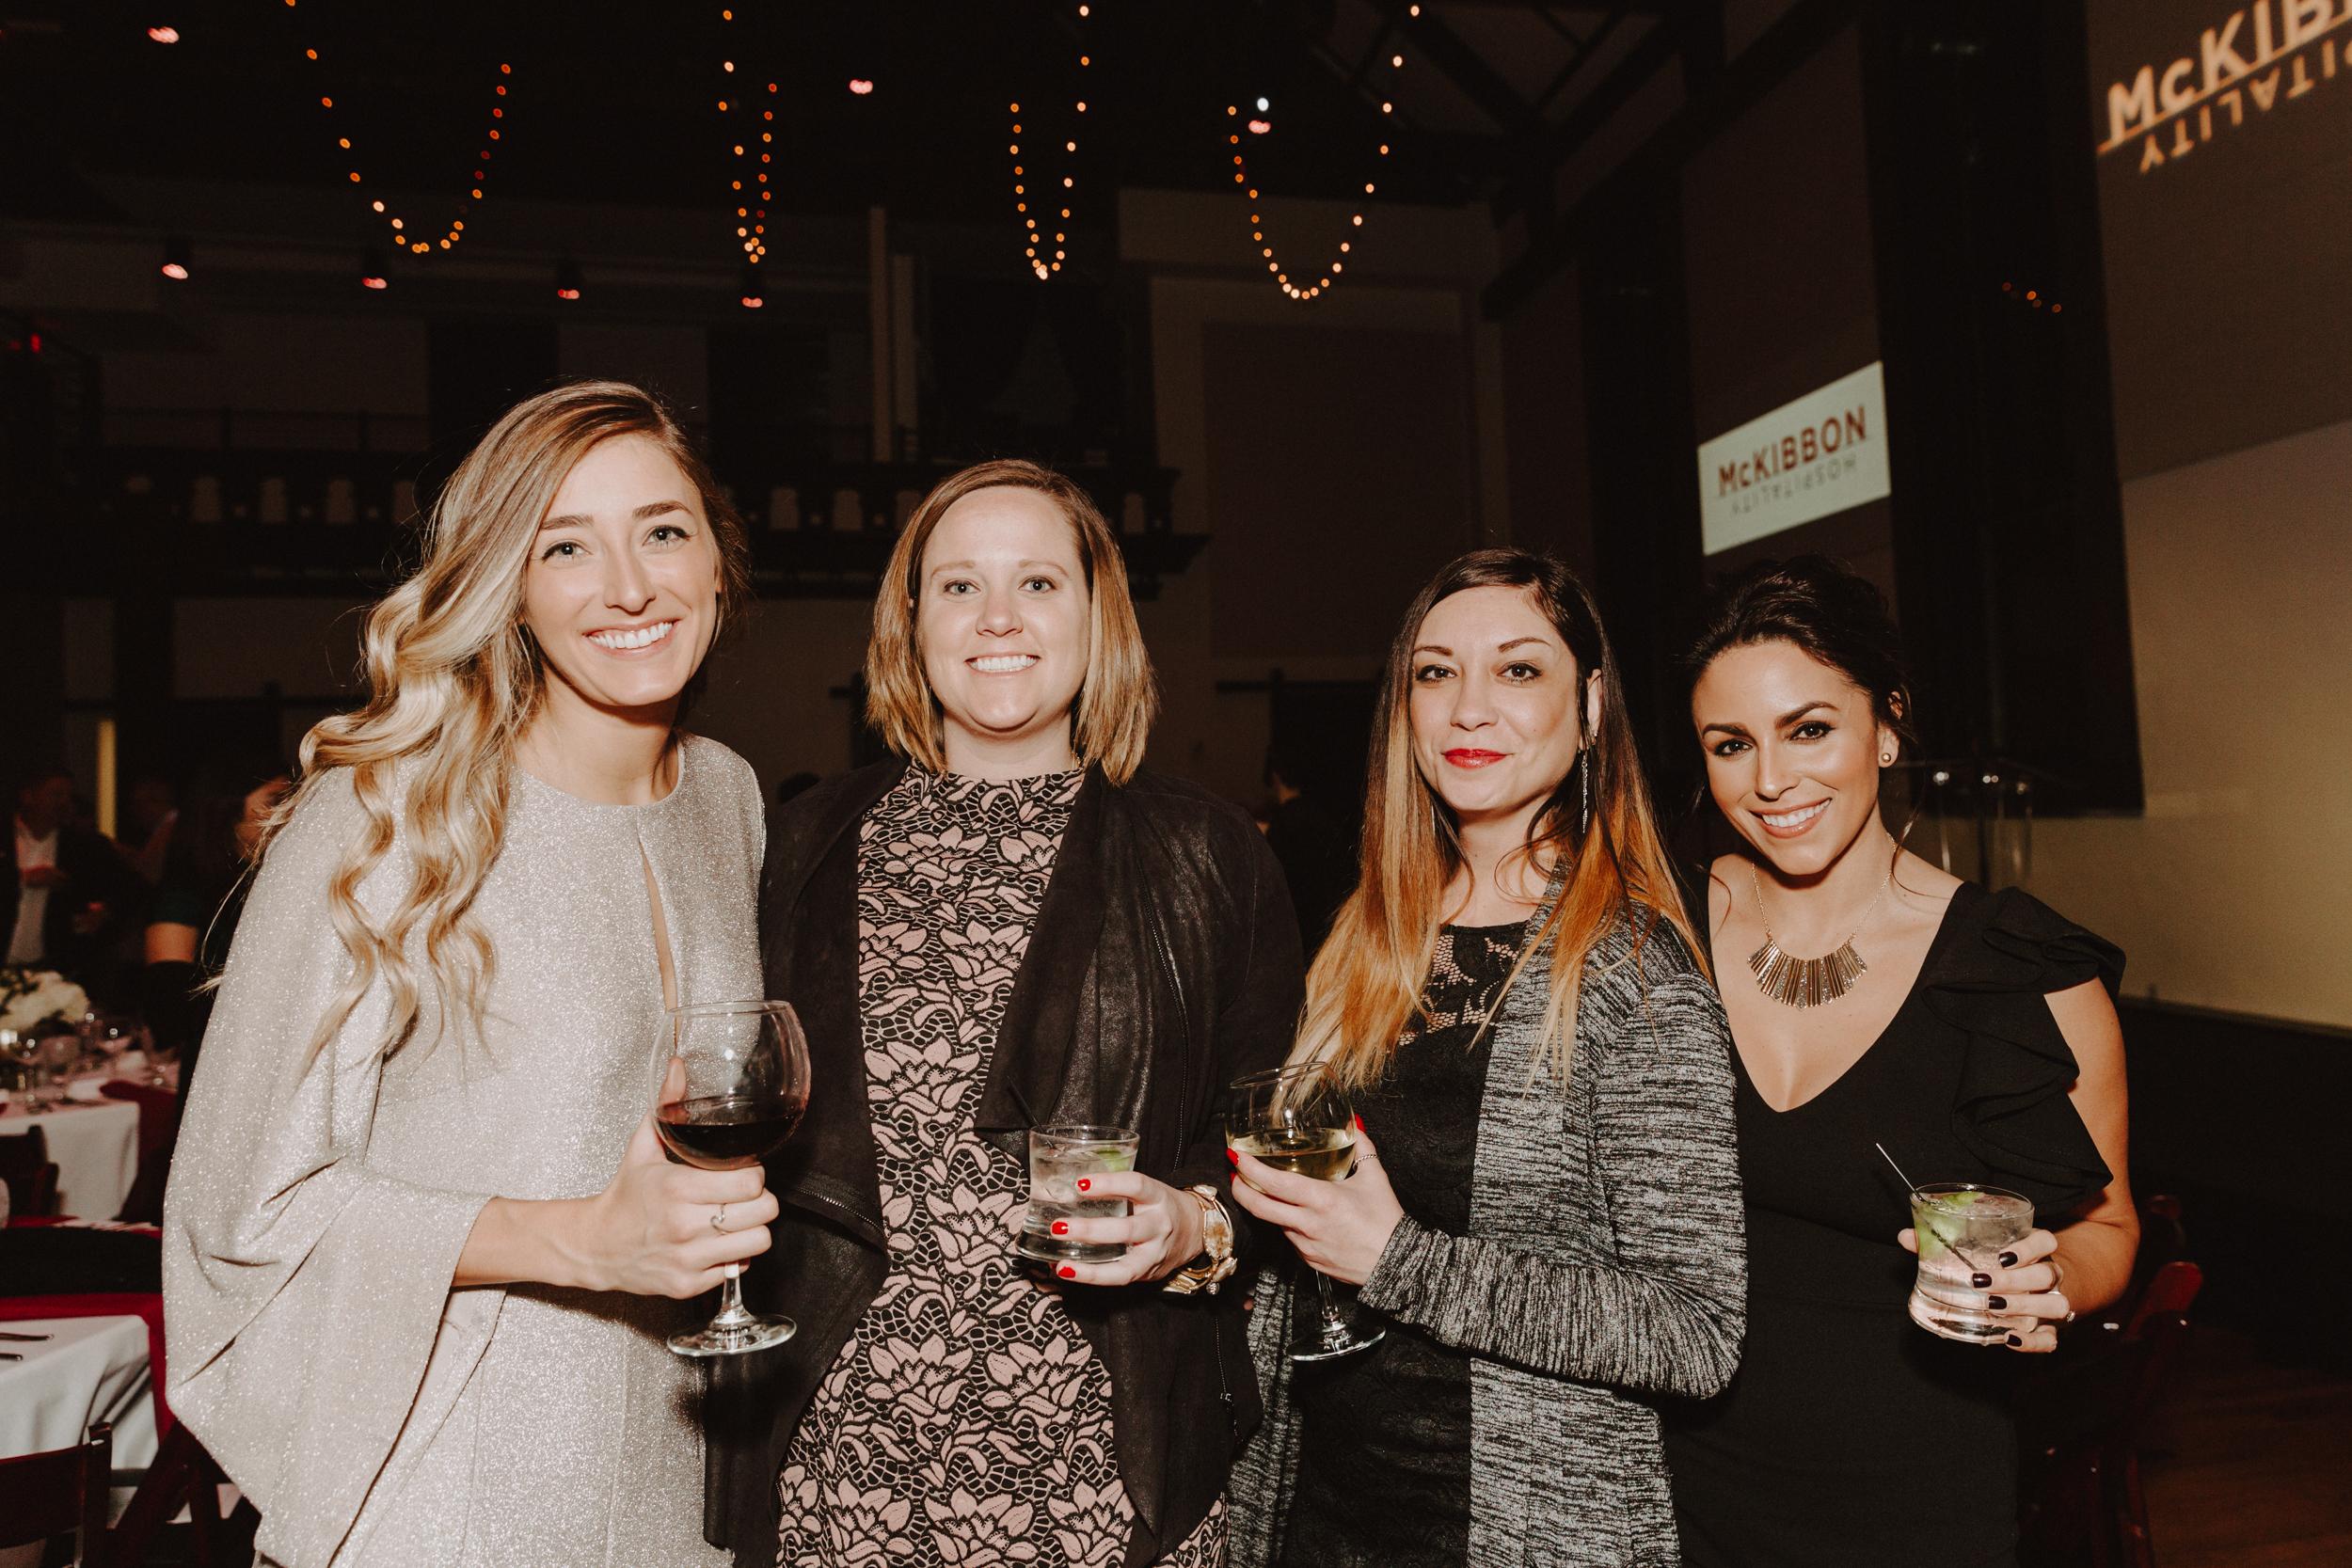 2018_McKibbon_ONE_AwardsNight-22.jpg